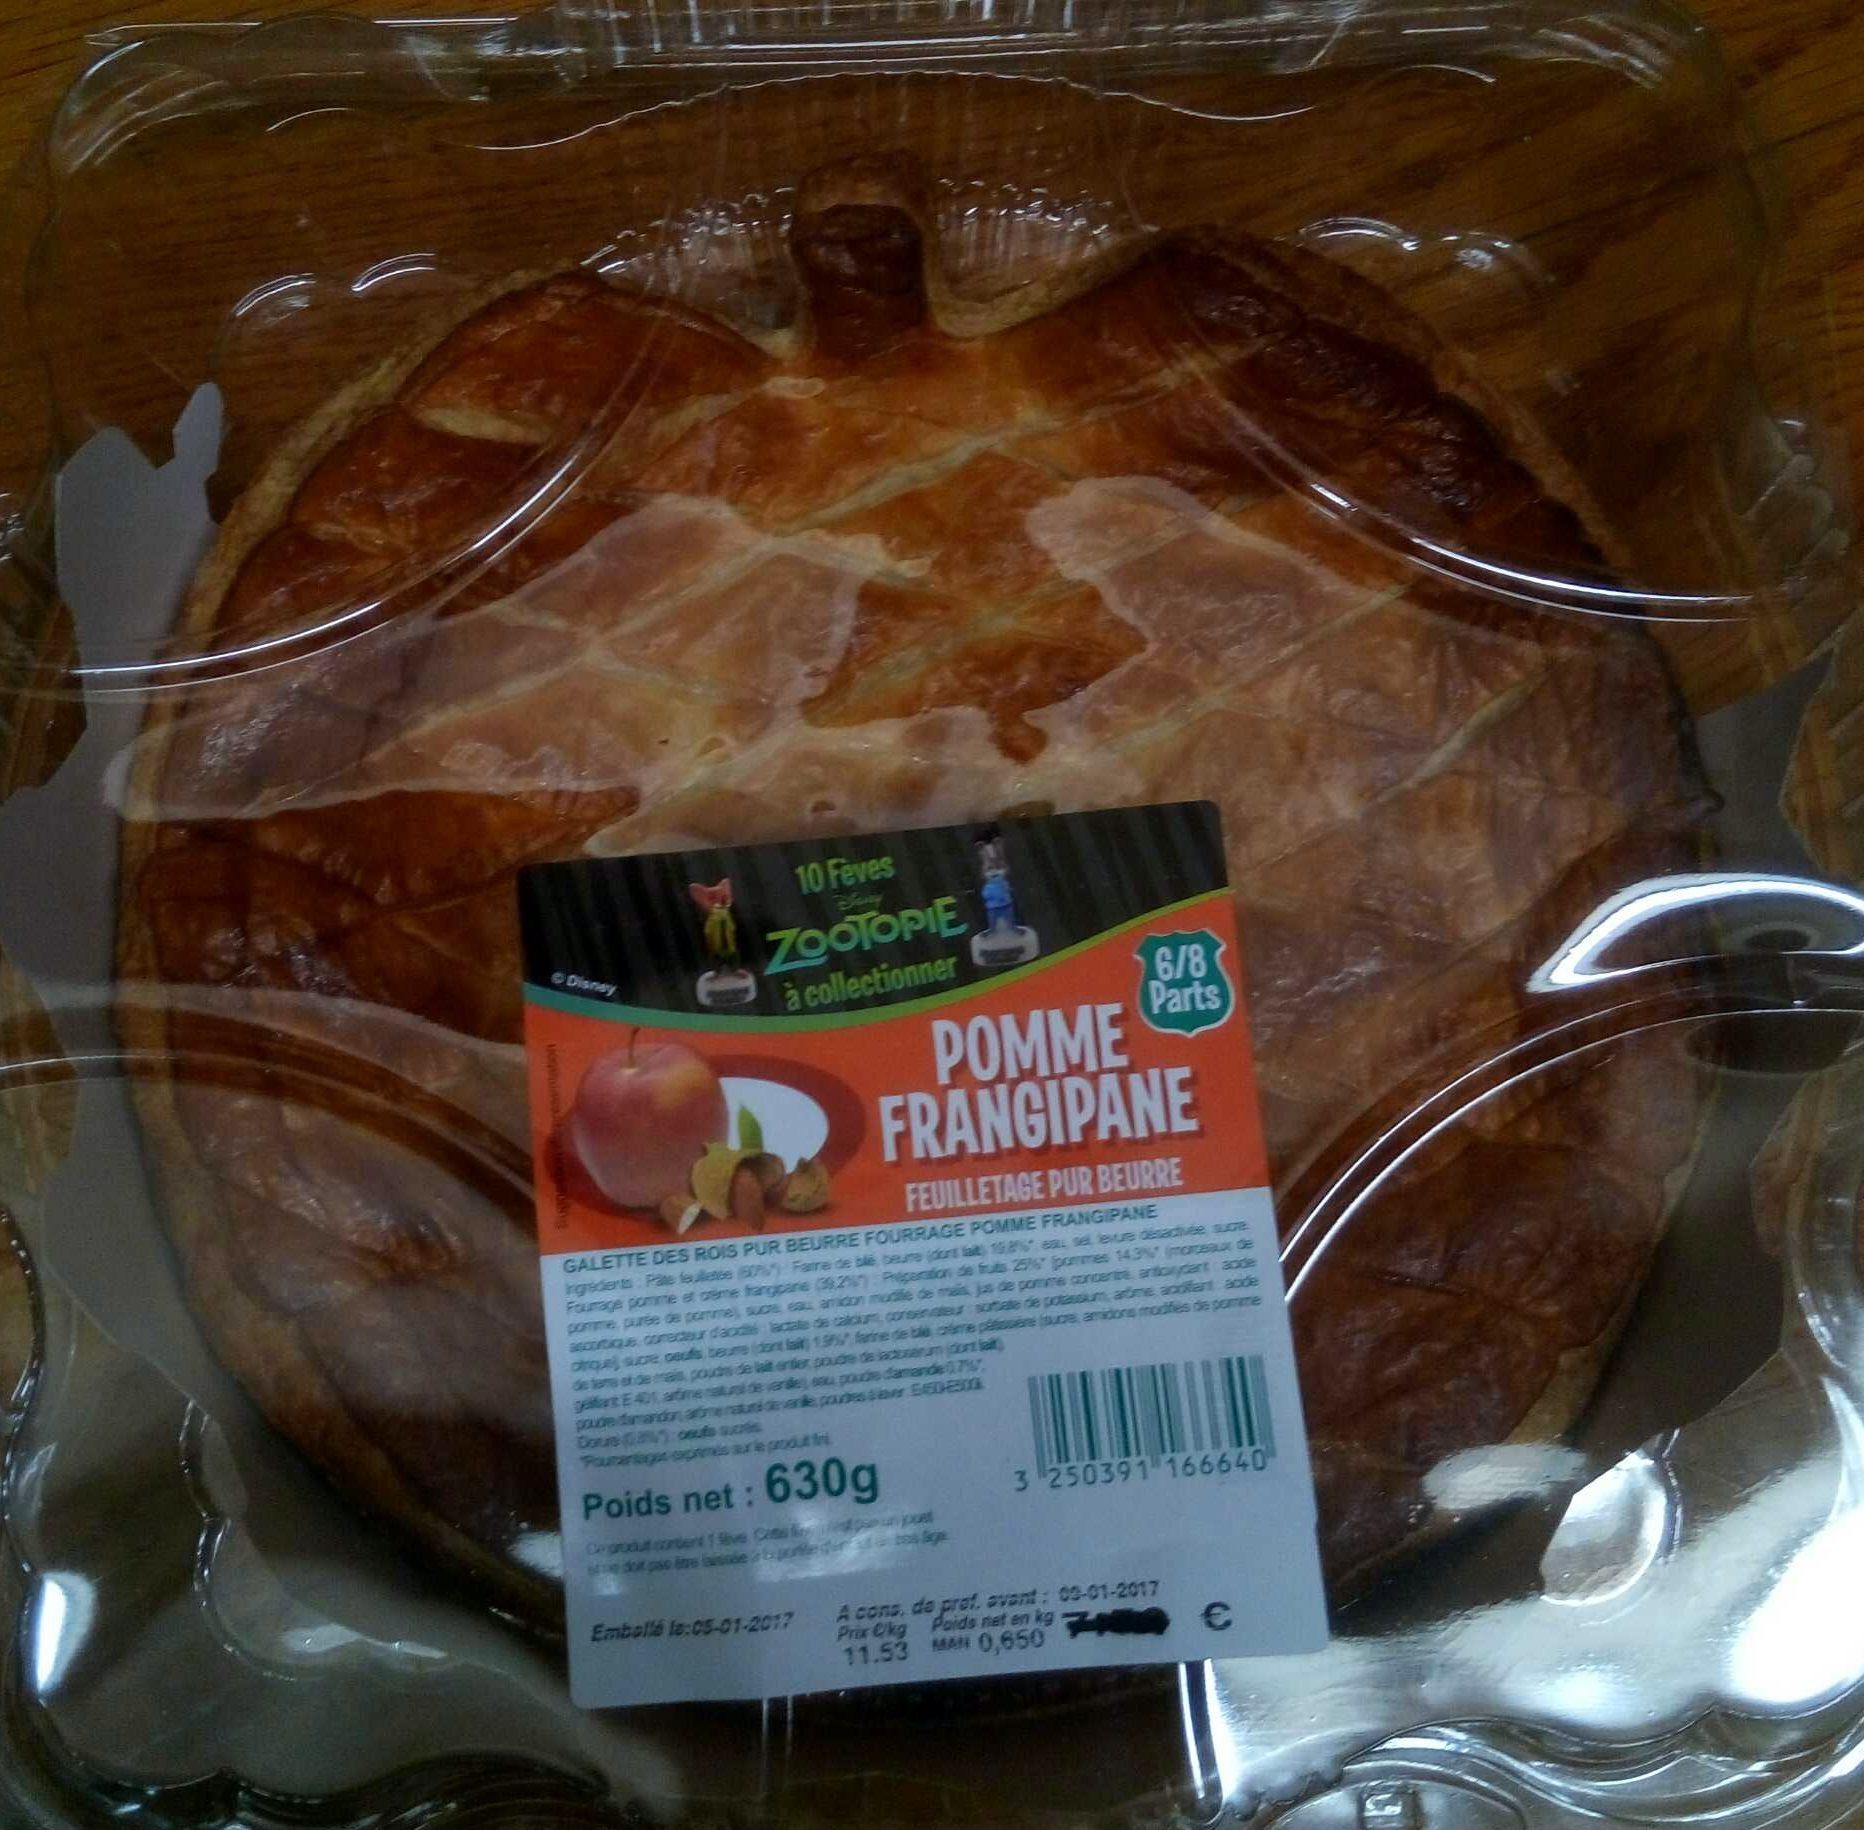 Galette des rois pomme frangipane - Product - fr